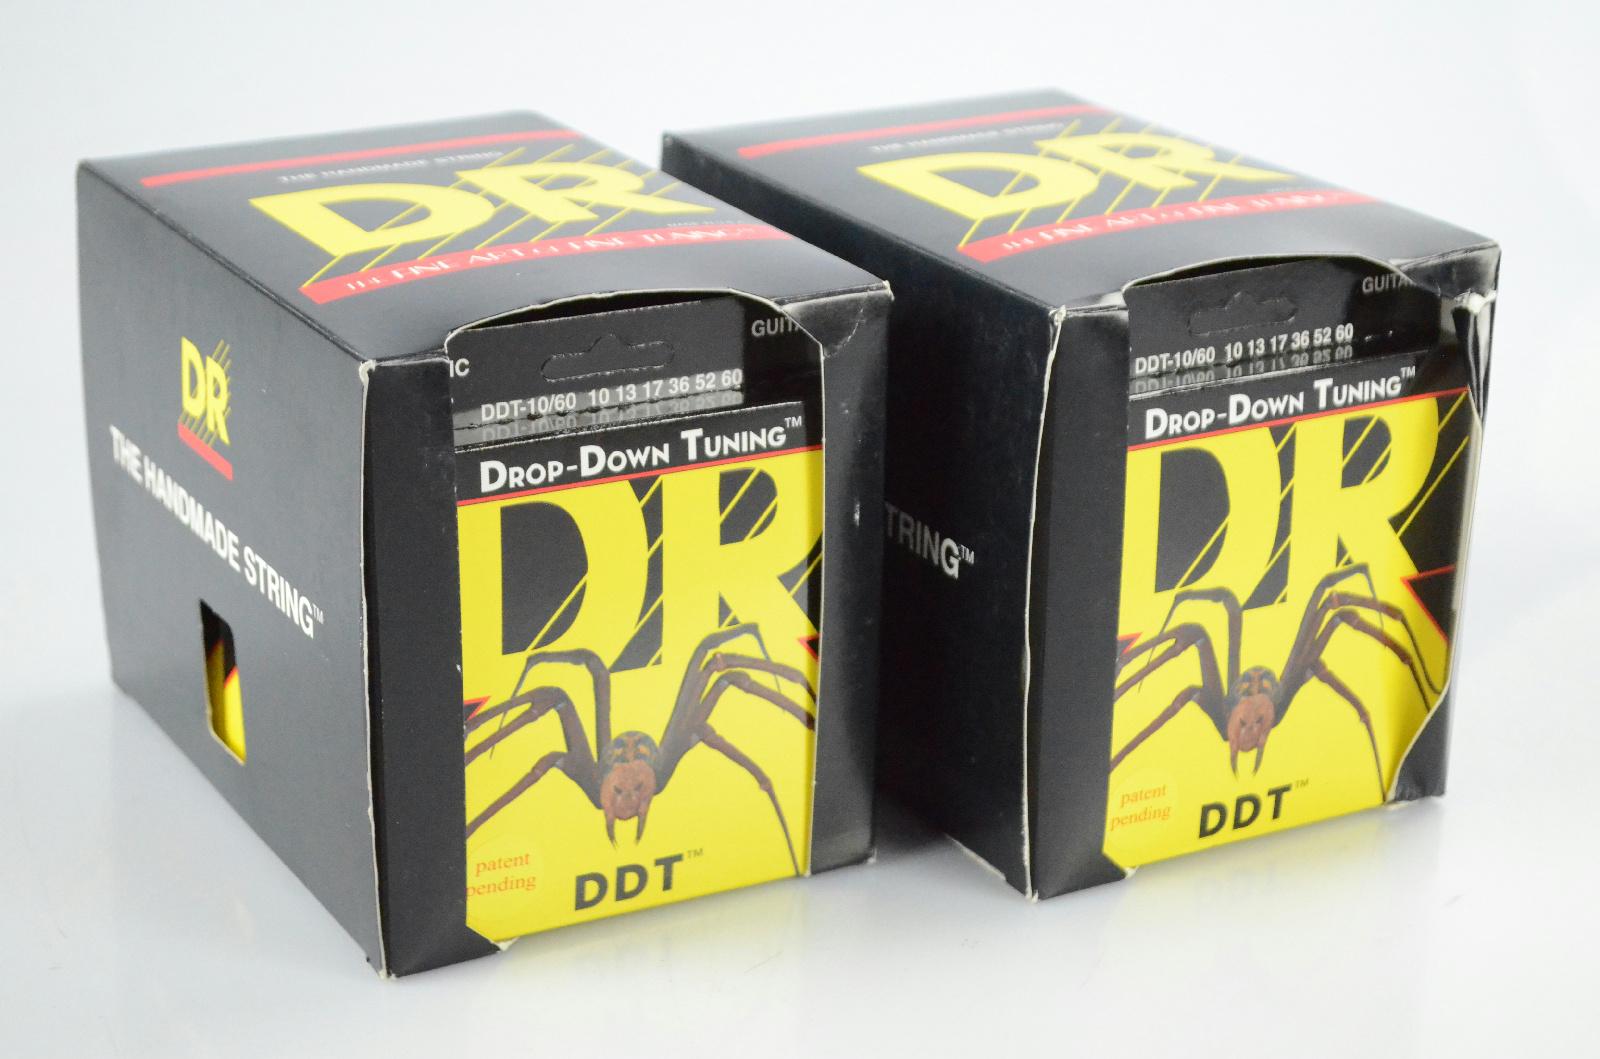 24 DR DDT-10/60 Sets 10-60 Drop-Down Tuning Guitar Strings Kato Khandwala #33873